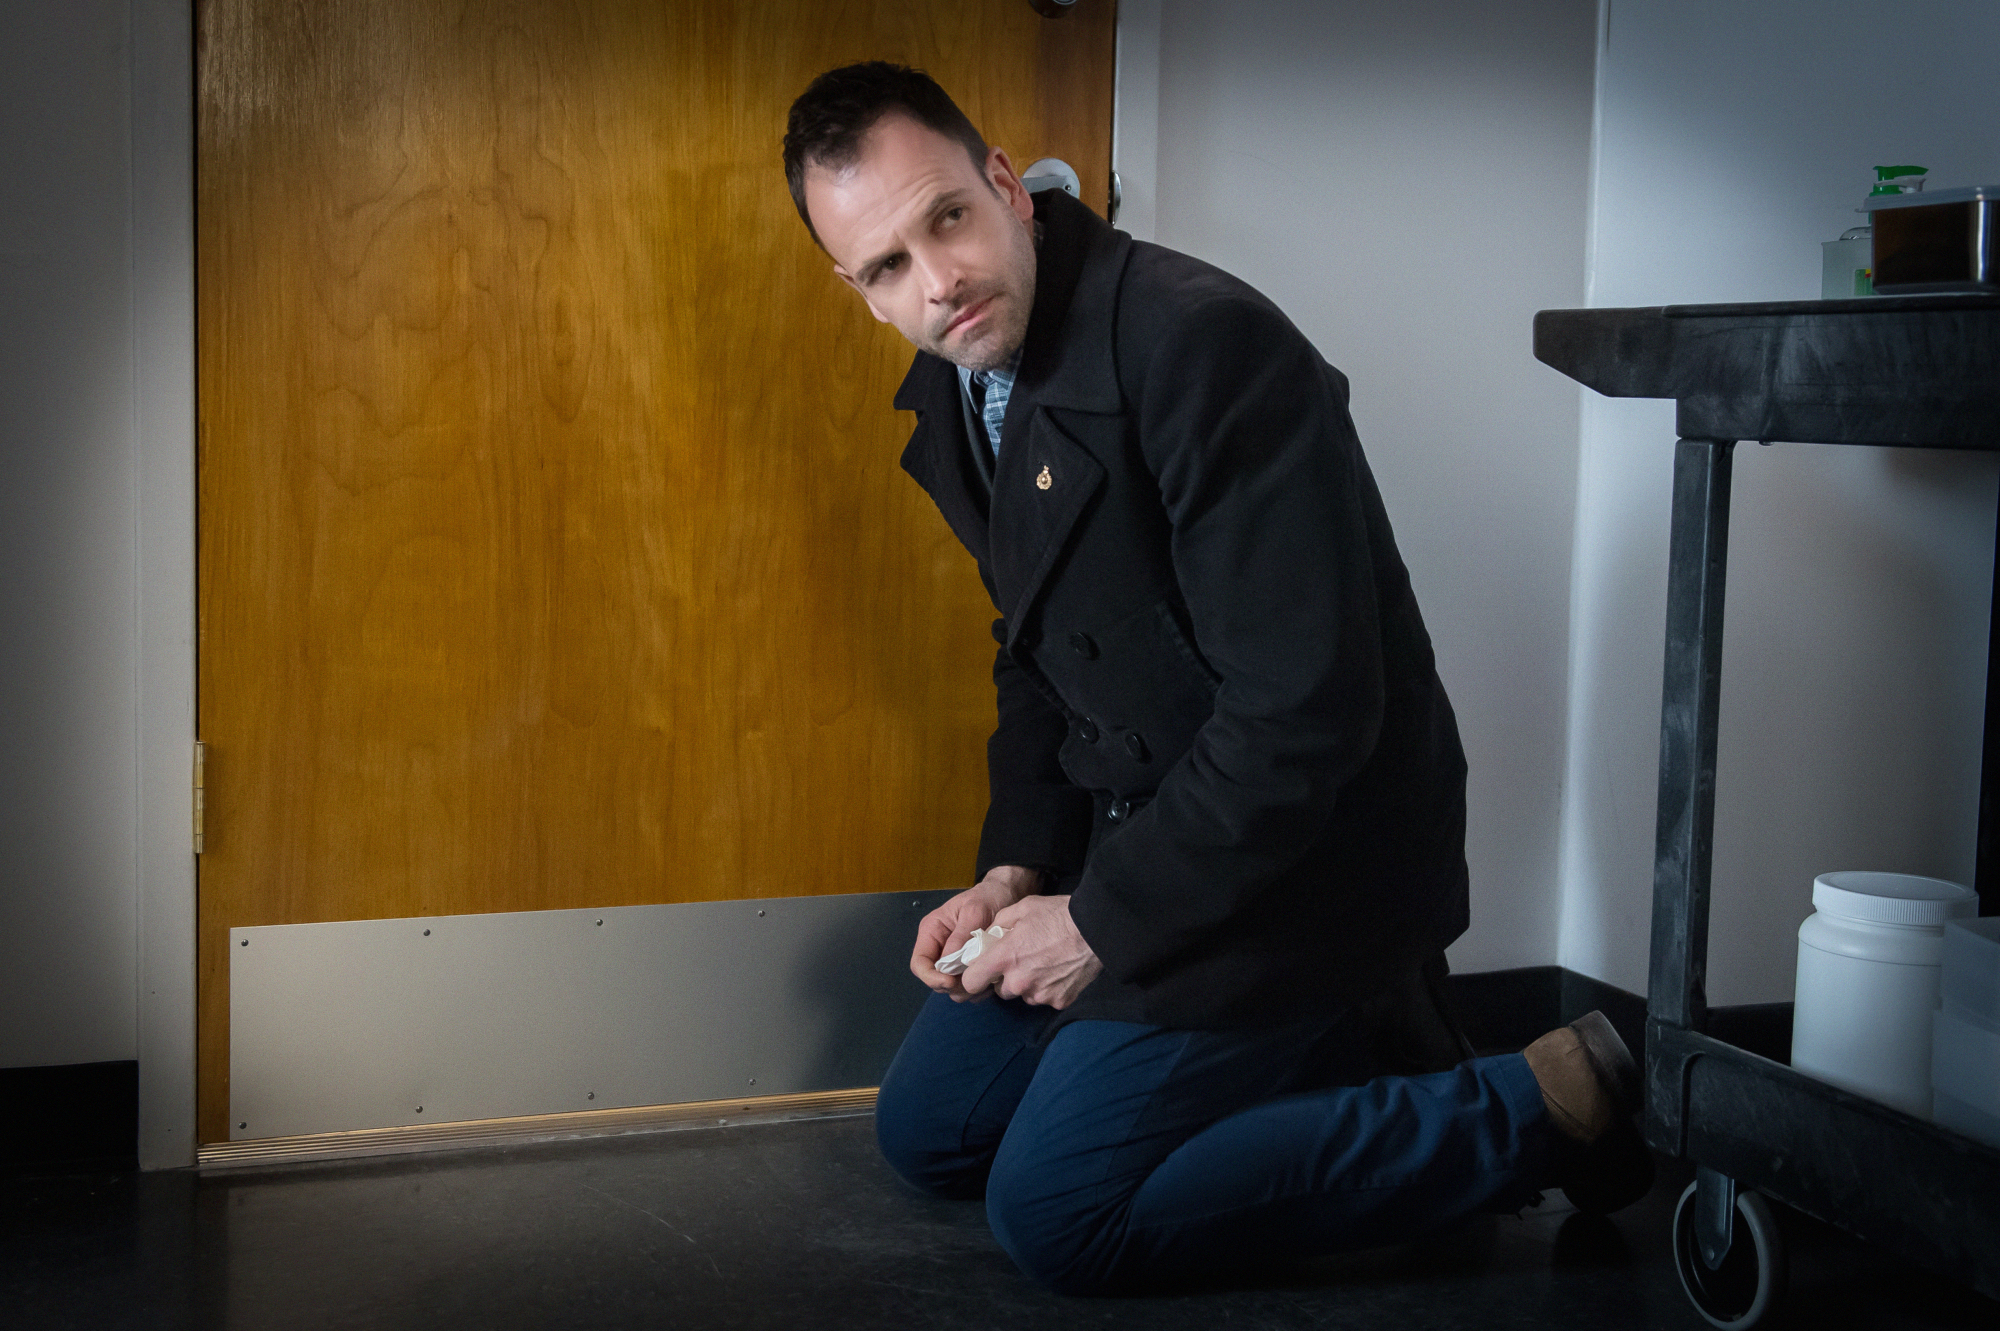 Holmes investigates in